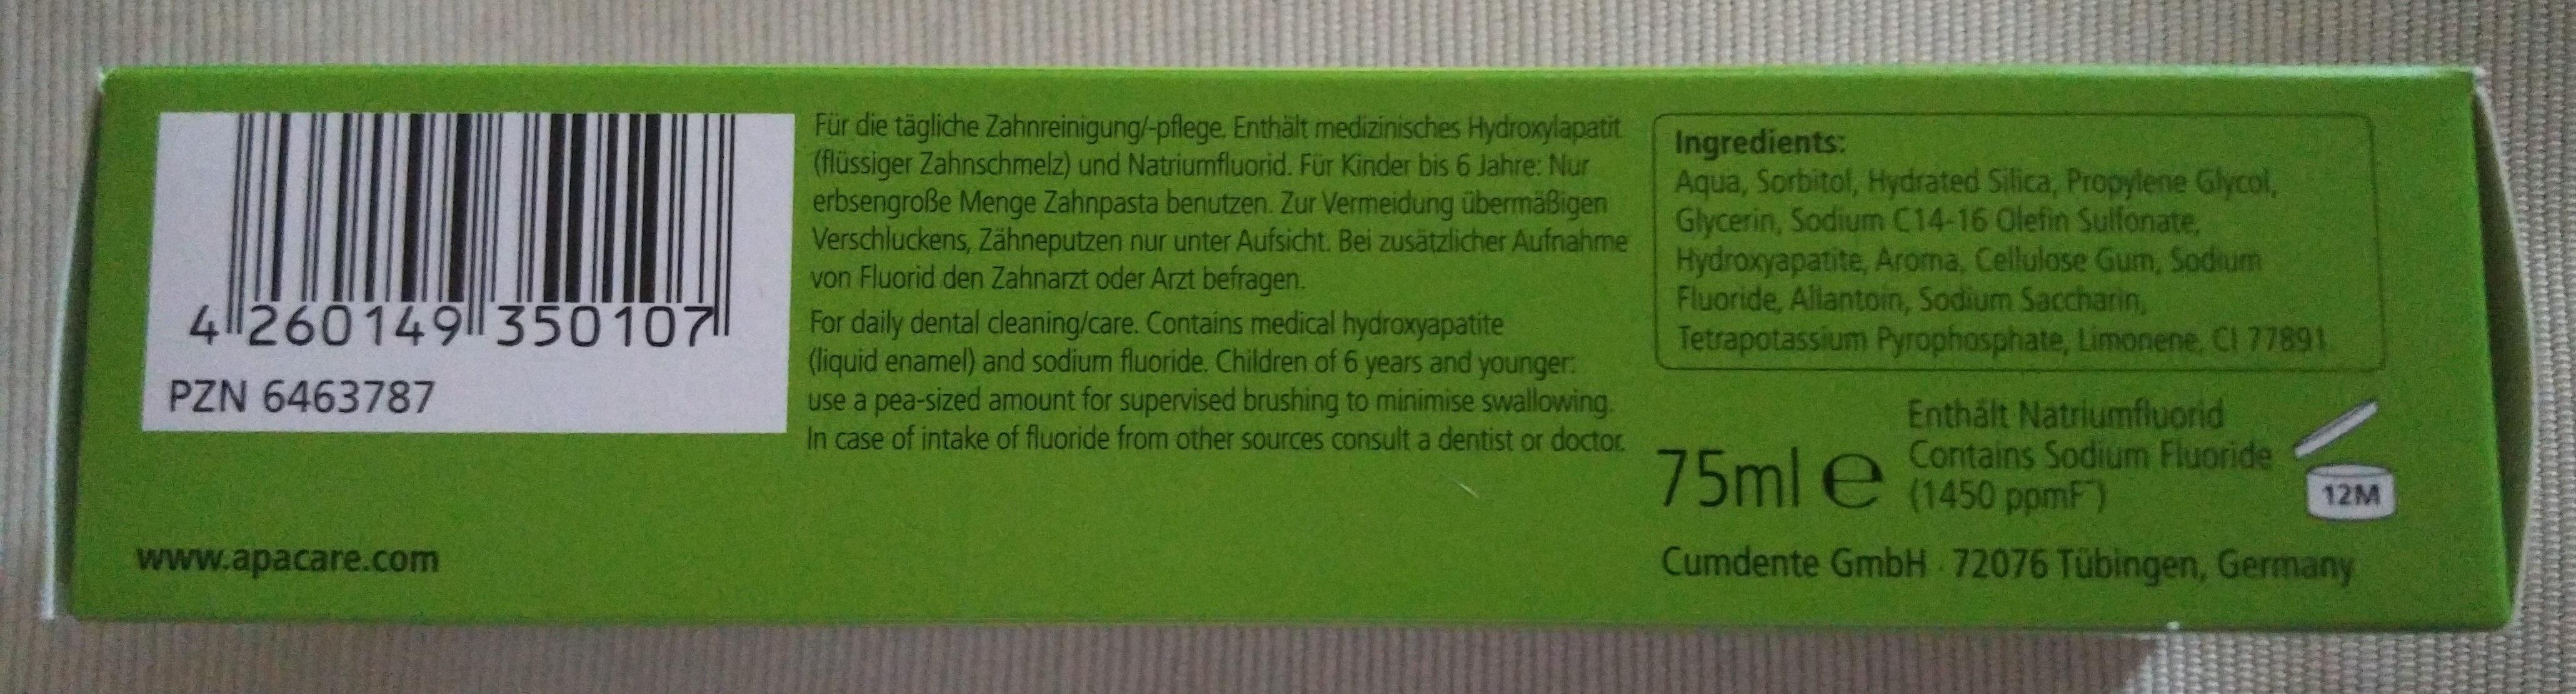 Care Zahncreme (Flüssiger Zahnschmelz) - Product - en